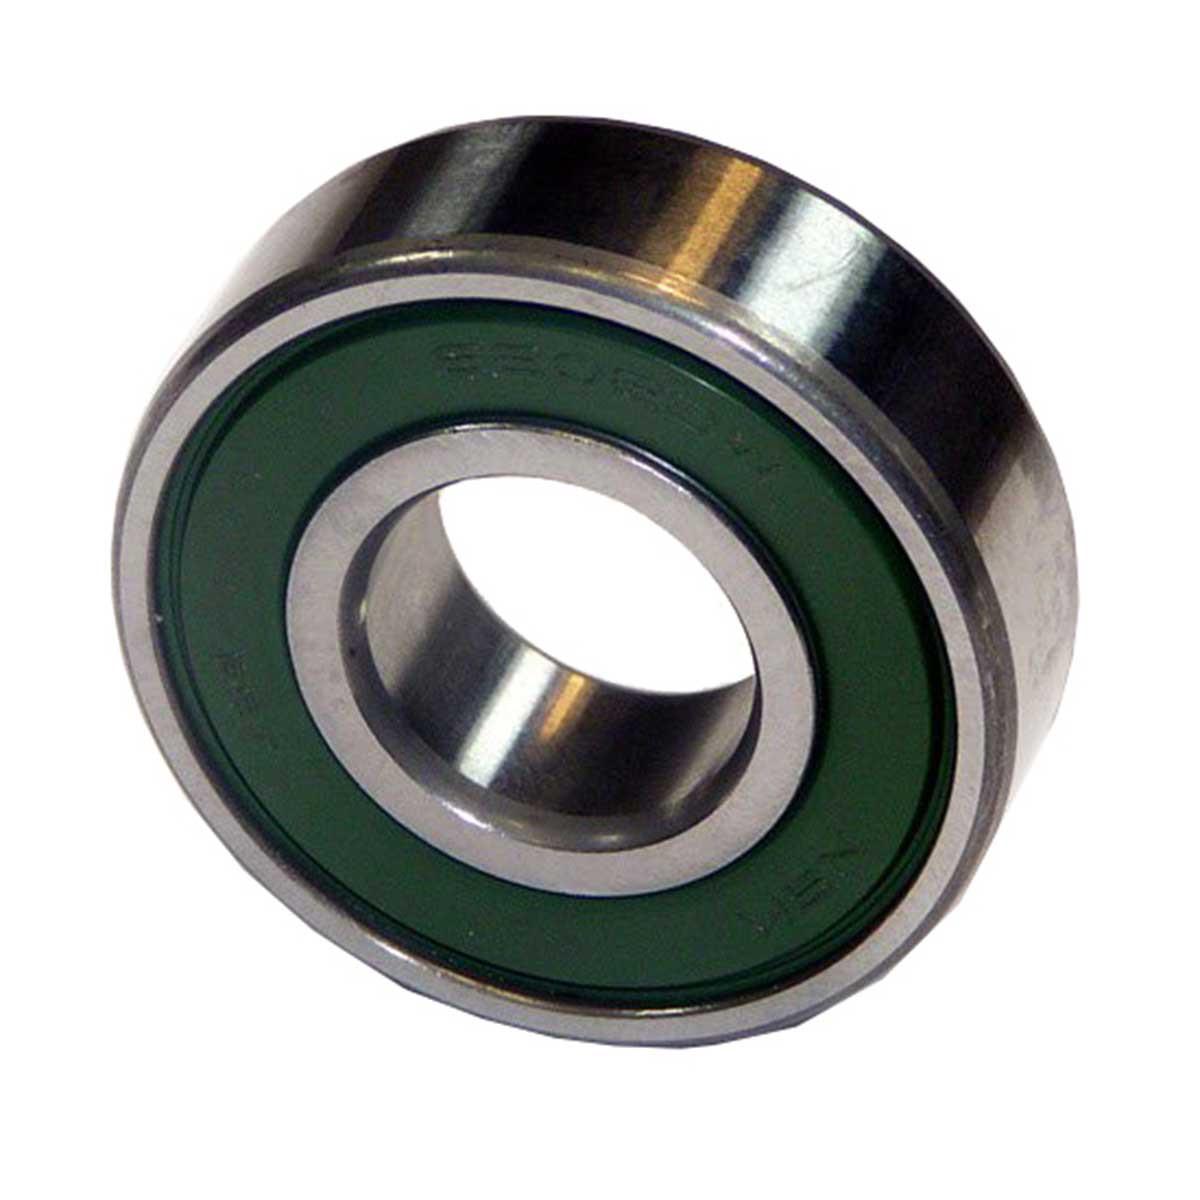 330003-60 Dewalt Ball Bearing